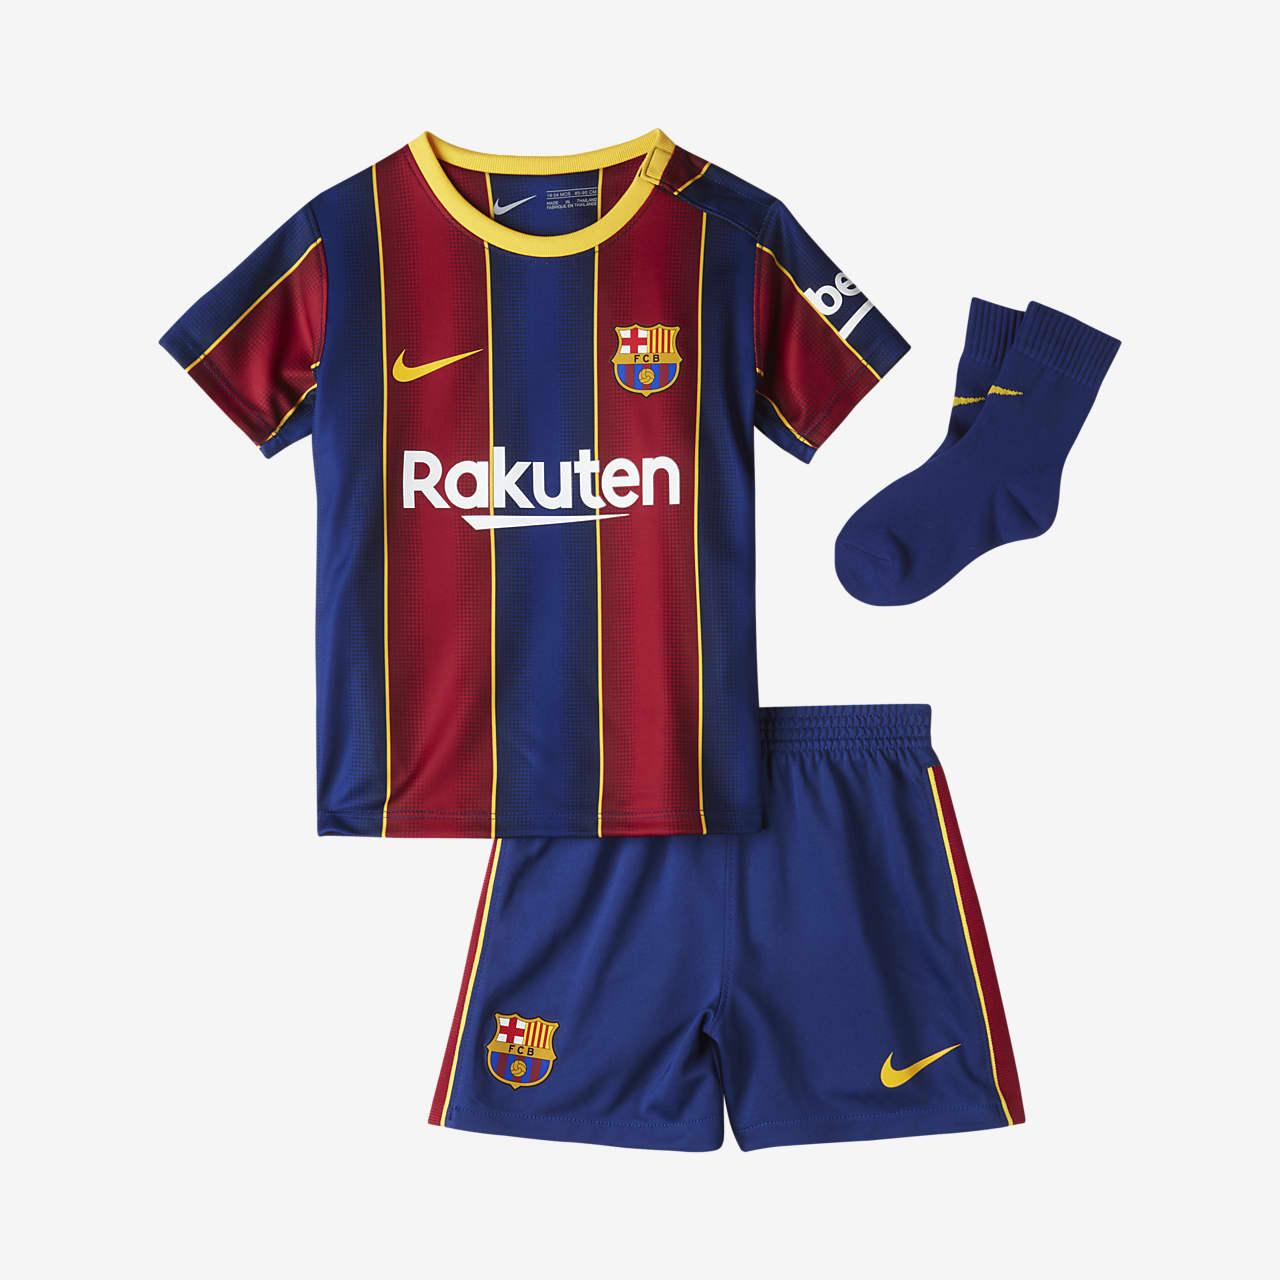 Baby and Toddler Football Kit. Nike GB